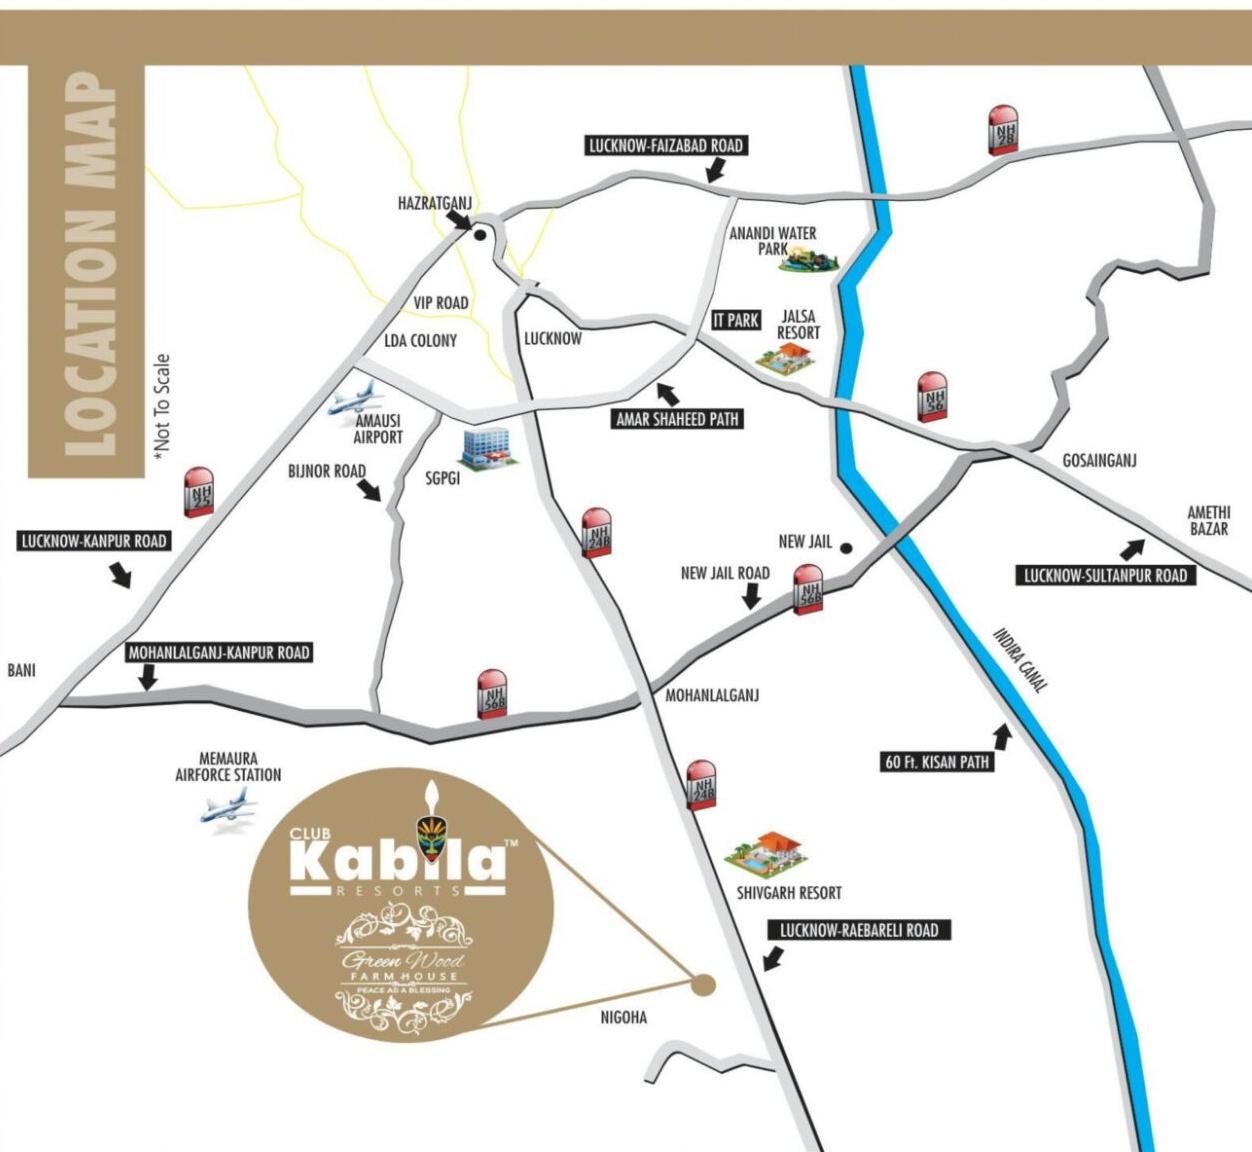 Macy S Herald Square Floor Plan: Signature Kabila Villas In Nigoha, Lucknow